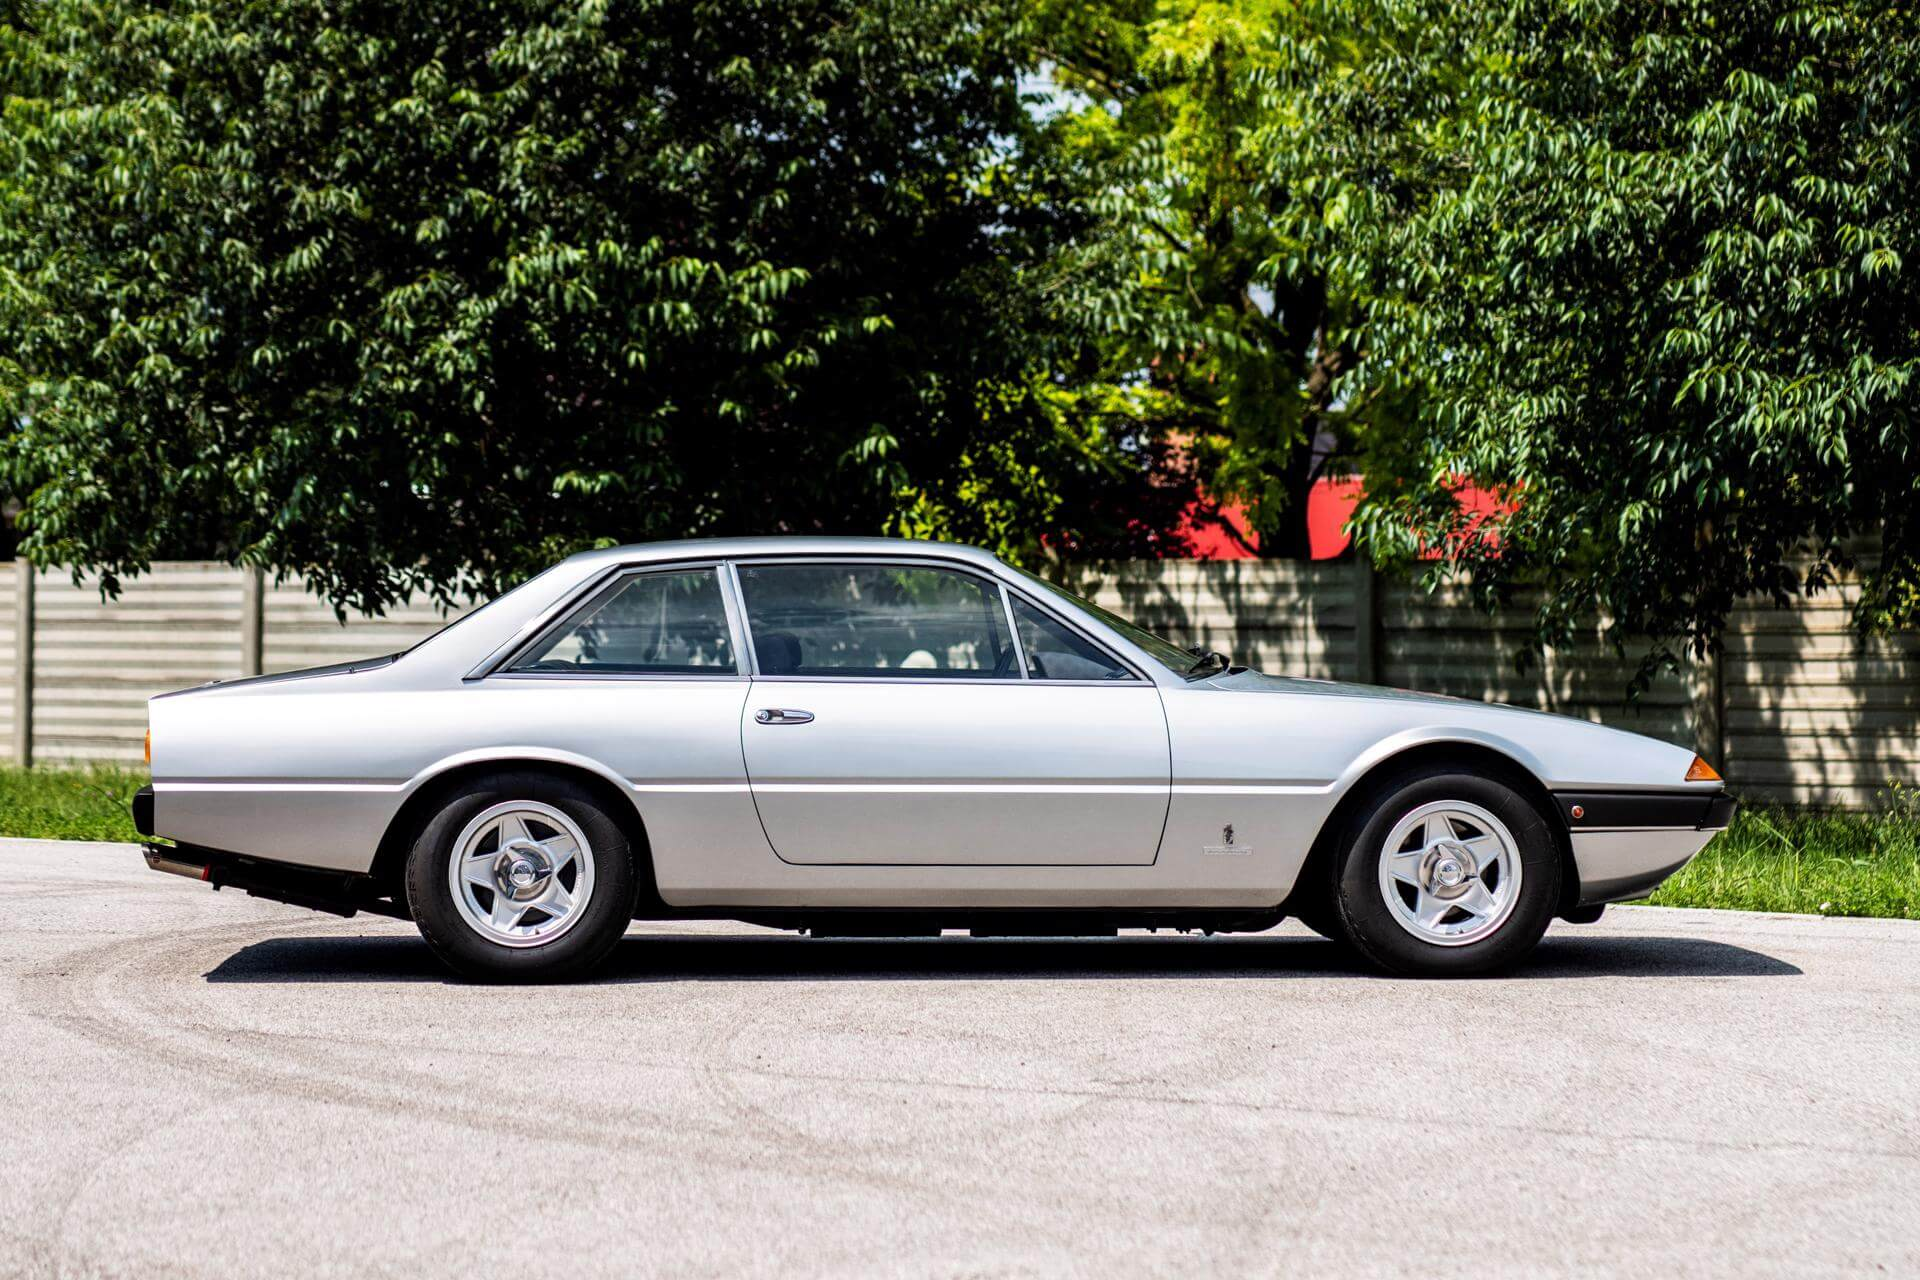 Real Art on Wheels | Ferrari 365 GT4 2+2